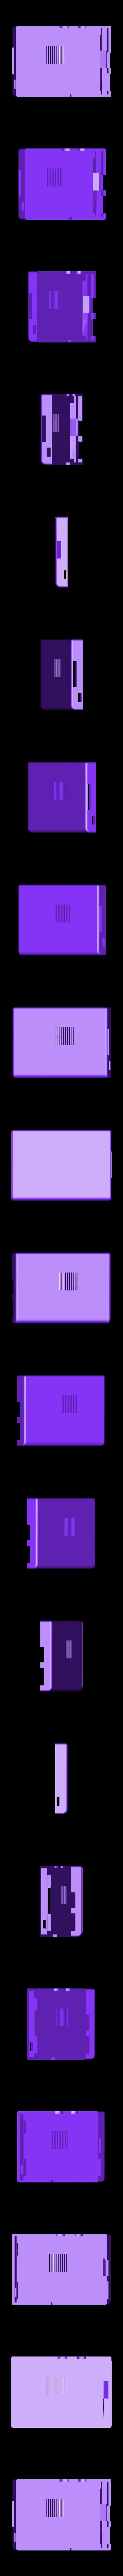 SegaPi_Bottom.stl Download free STL file Sega Pi - Genesis Raspberry Pi-2 Case • 3D printable object, Geoffro